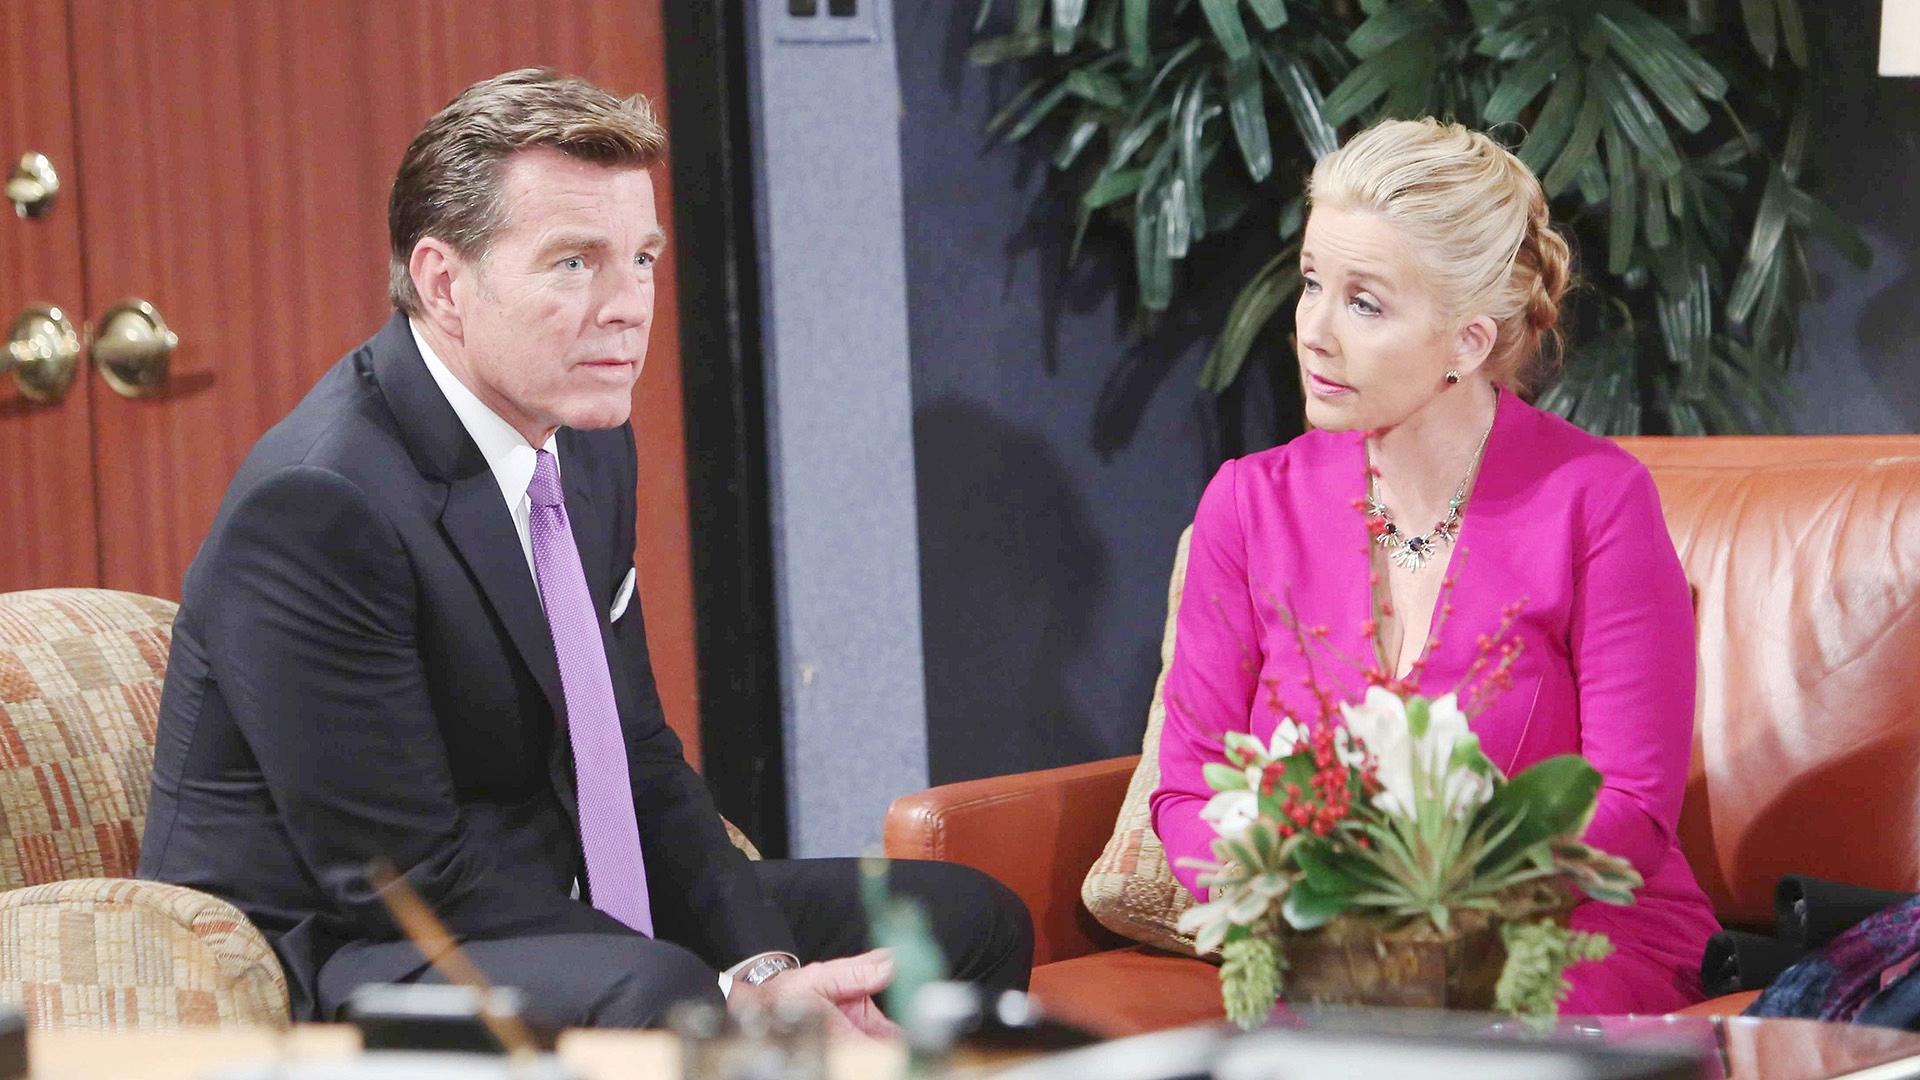 Jack evaluates his relationship with Nikki.